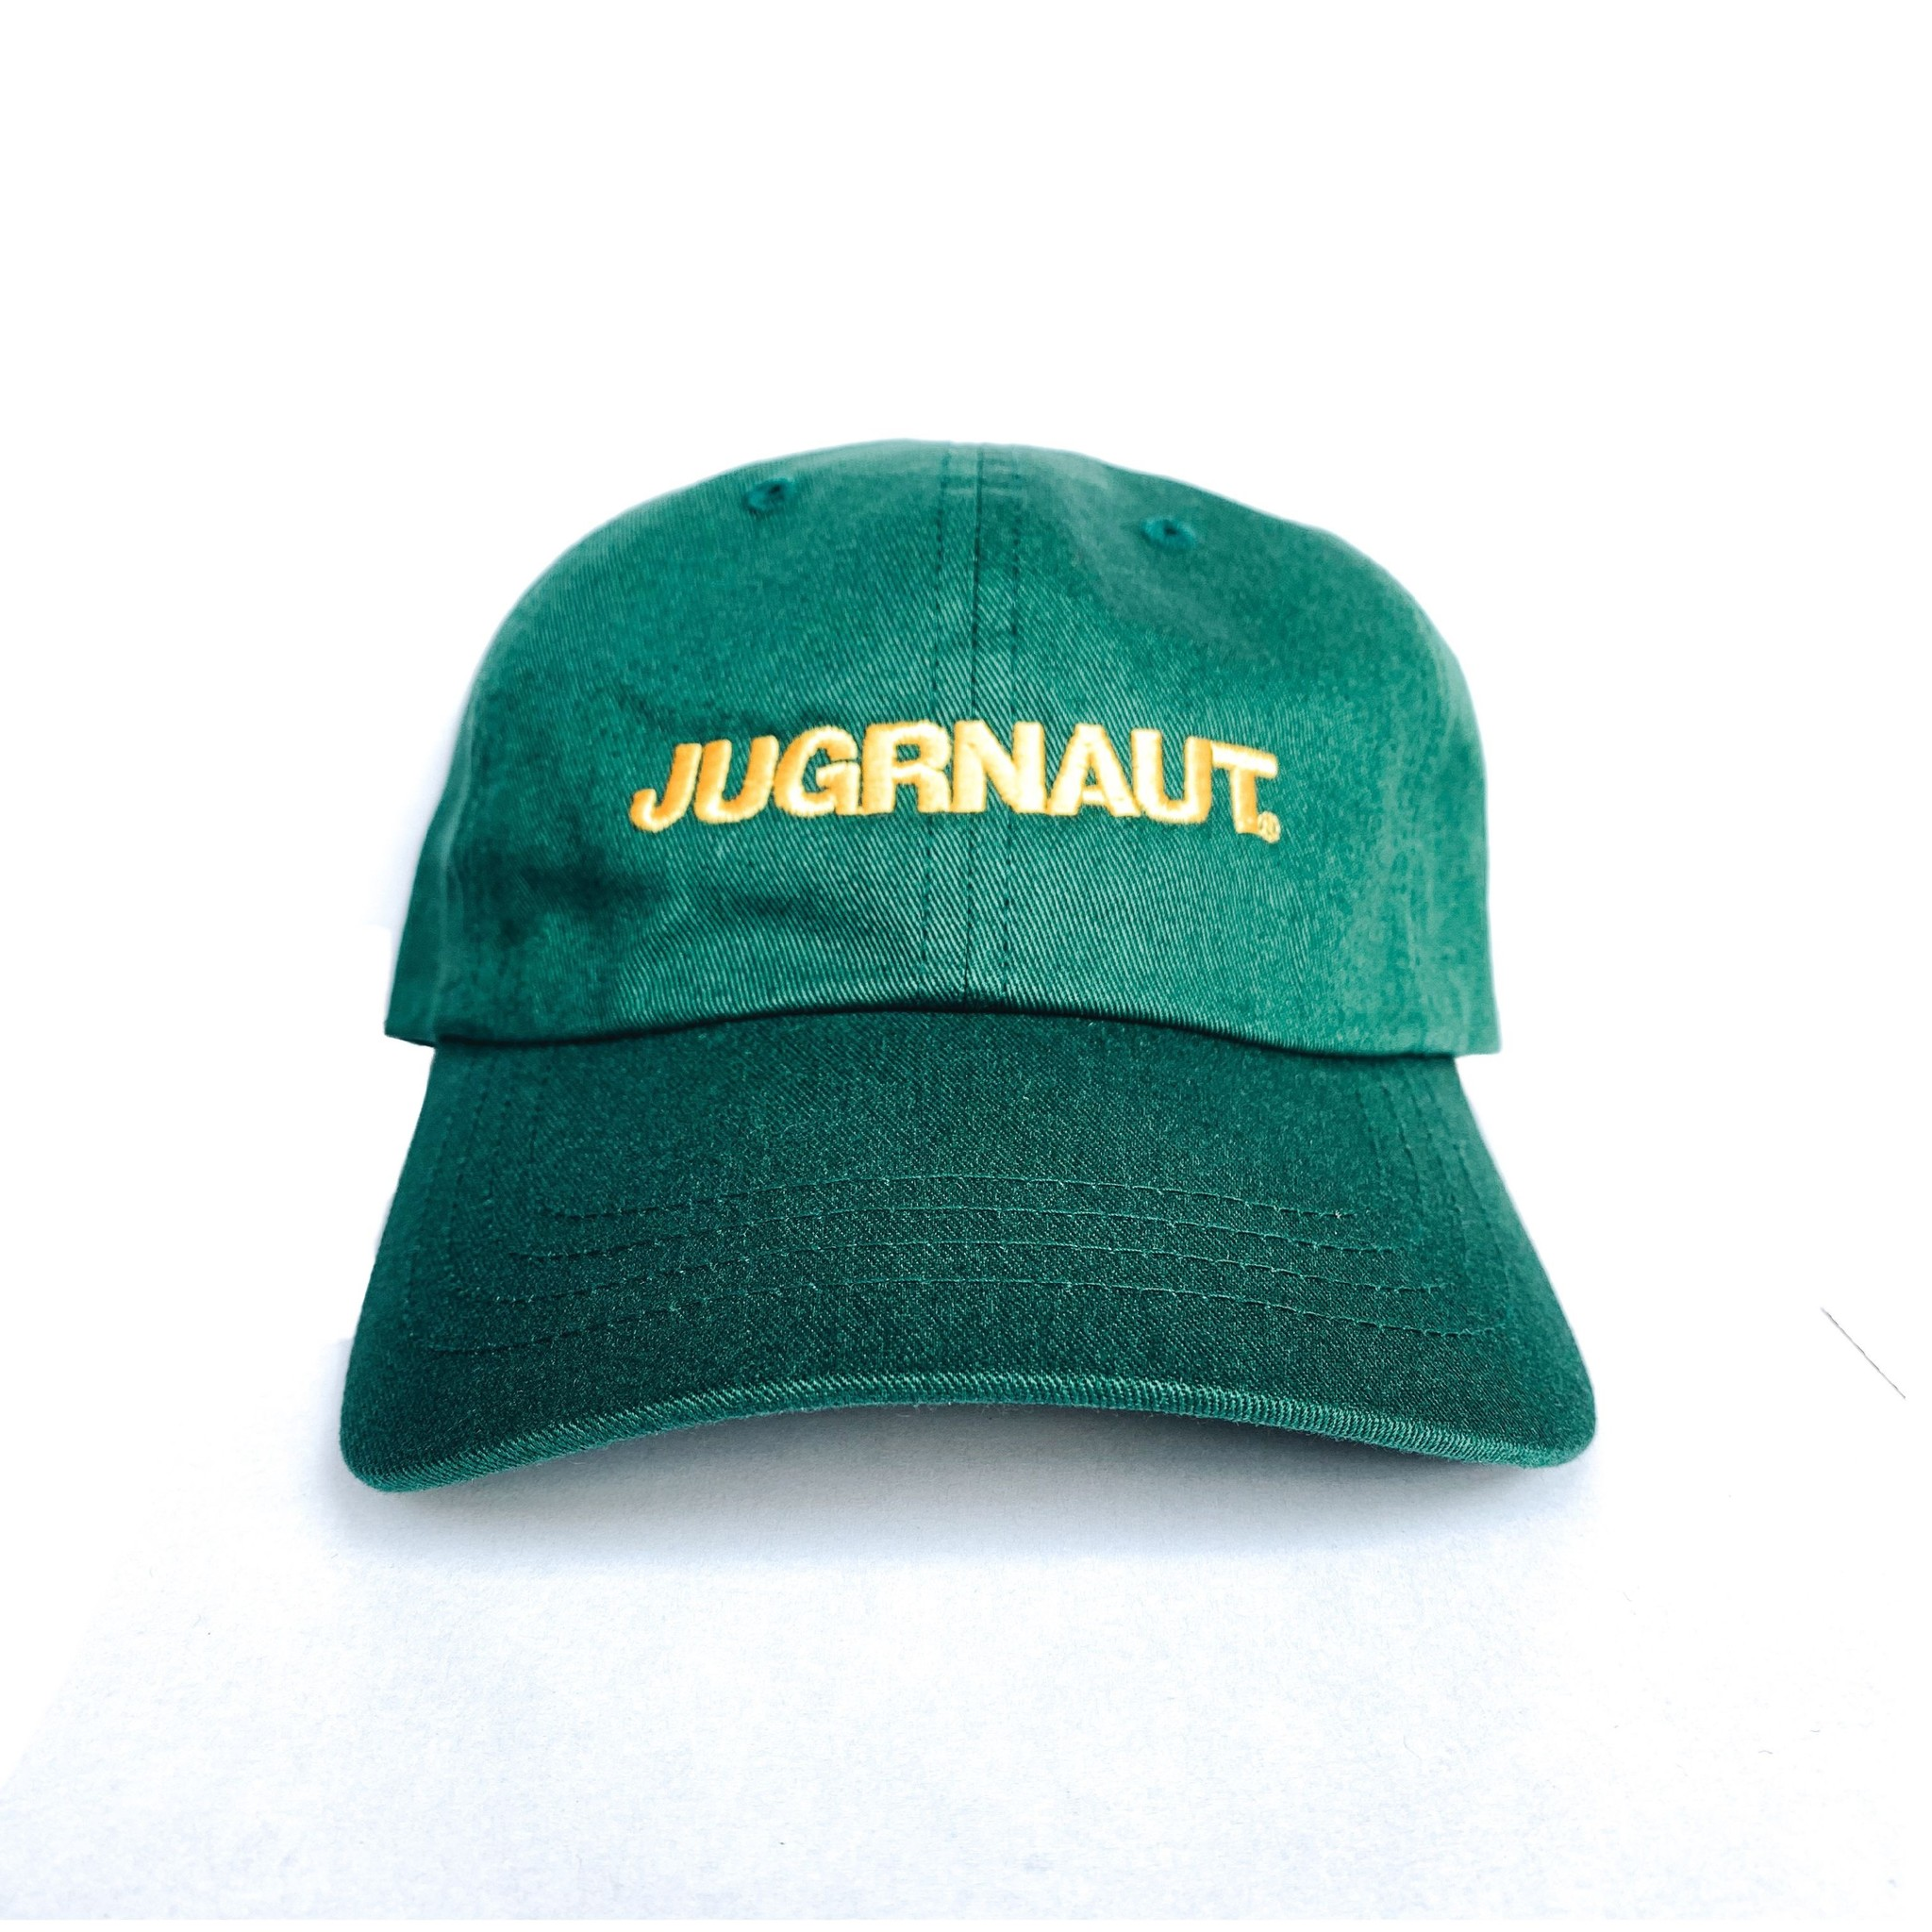 Jugrnaut Jugrnaut Sportsman Go ILL cap Green